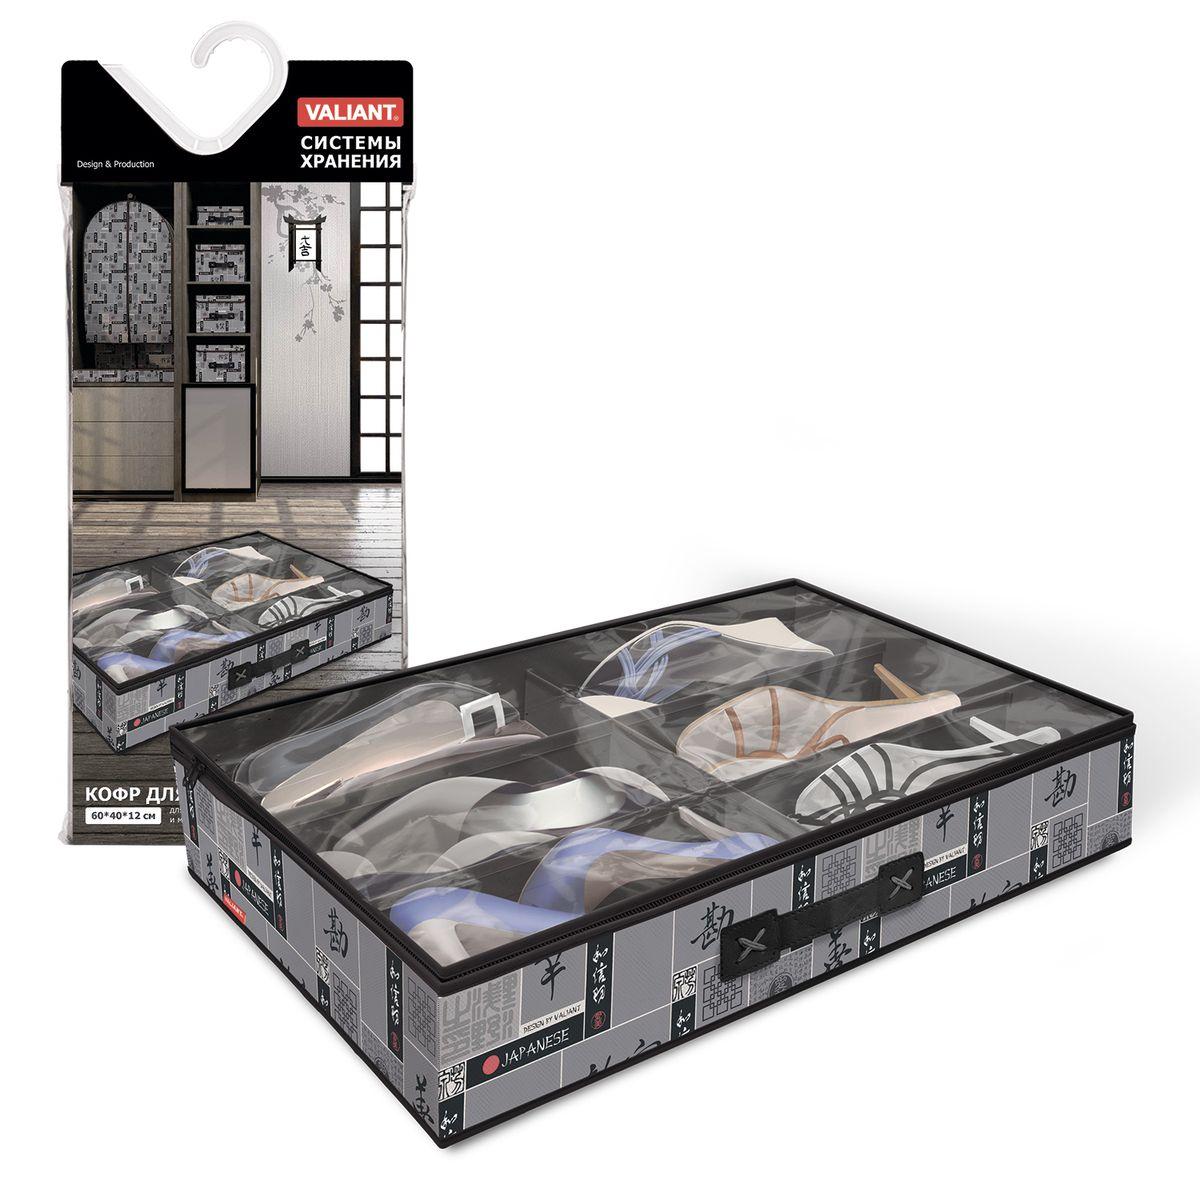 Кофр для хранения обуви Valiant Japanese Black, 6 секций, 60 х 40 х 12 см кофр для хранения valiant romantic 60 х 50 х 35 см